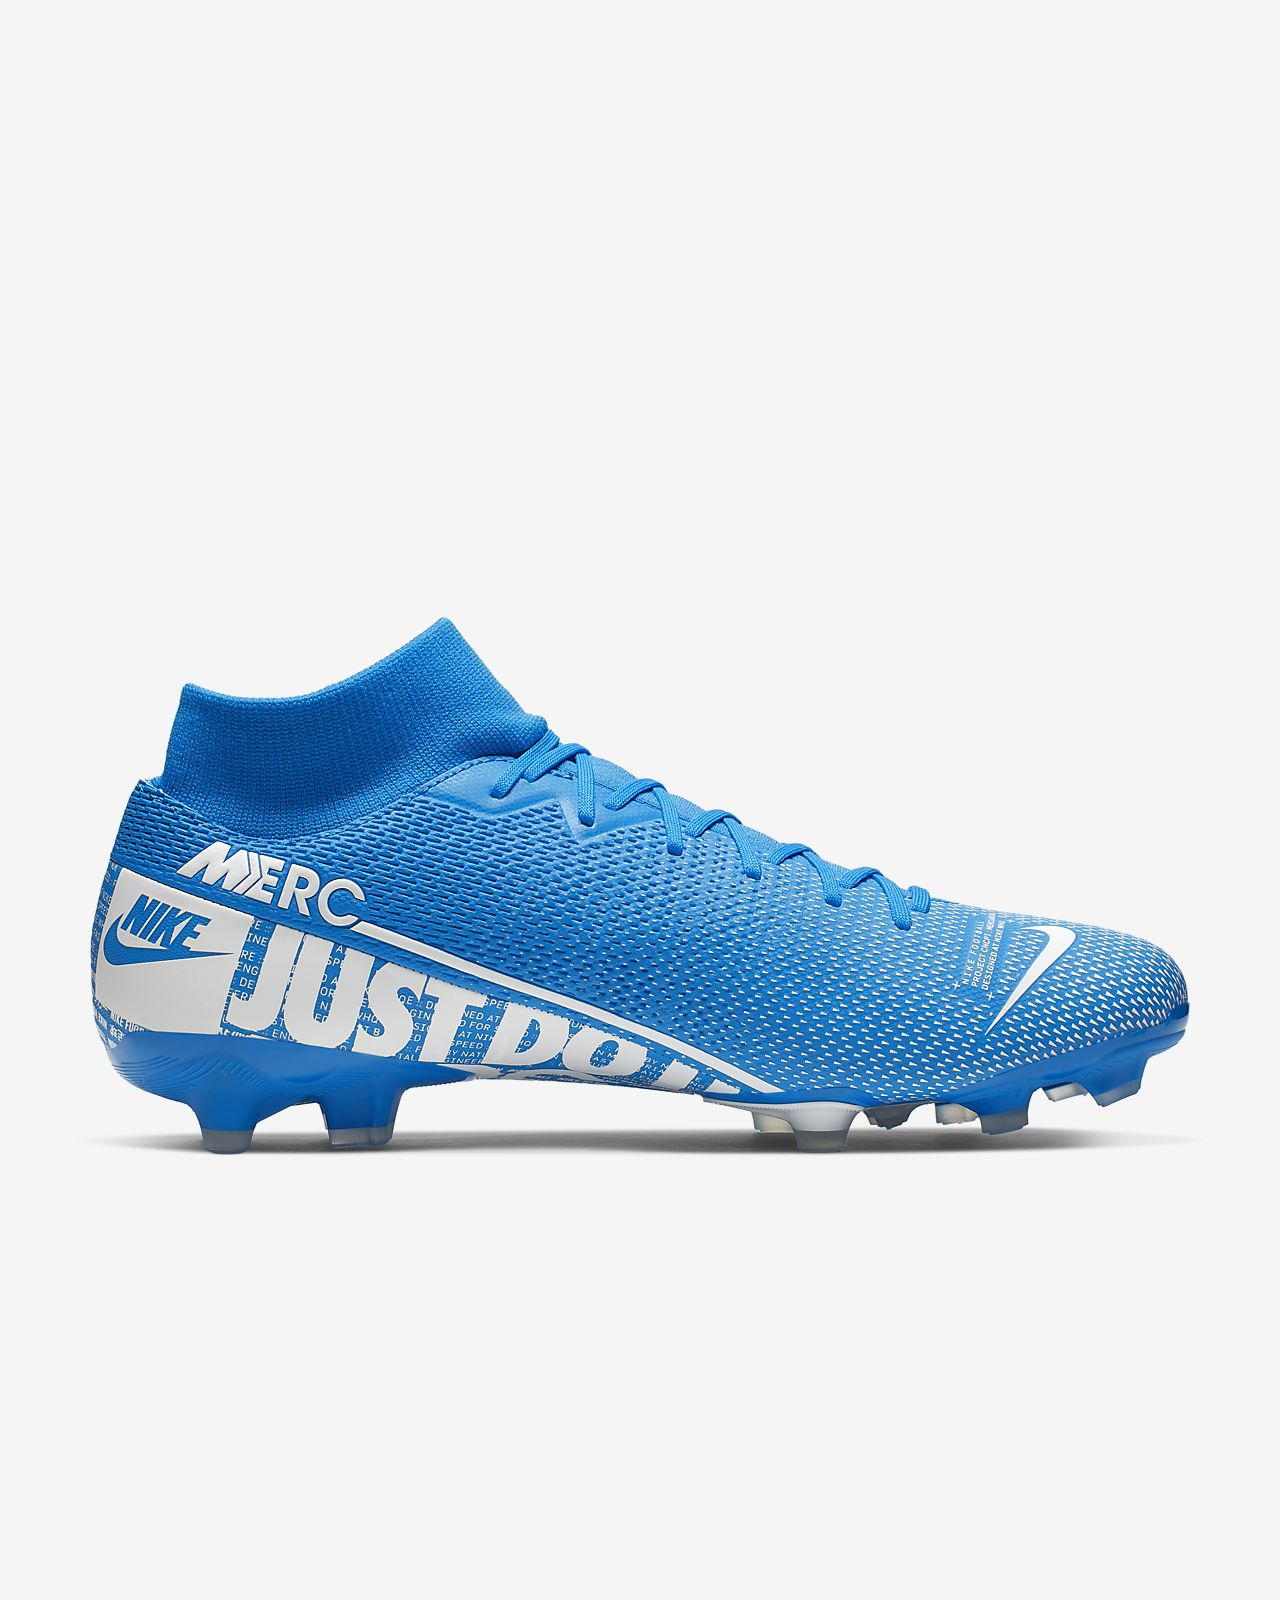 Nike Mercurial Superfly 7 Academy MG Multi,Ground Football Boot